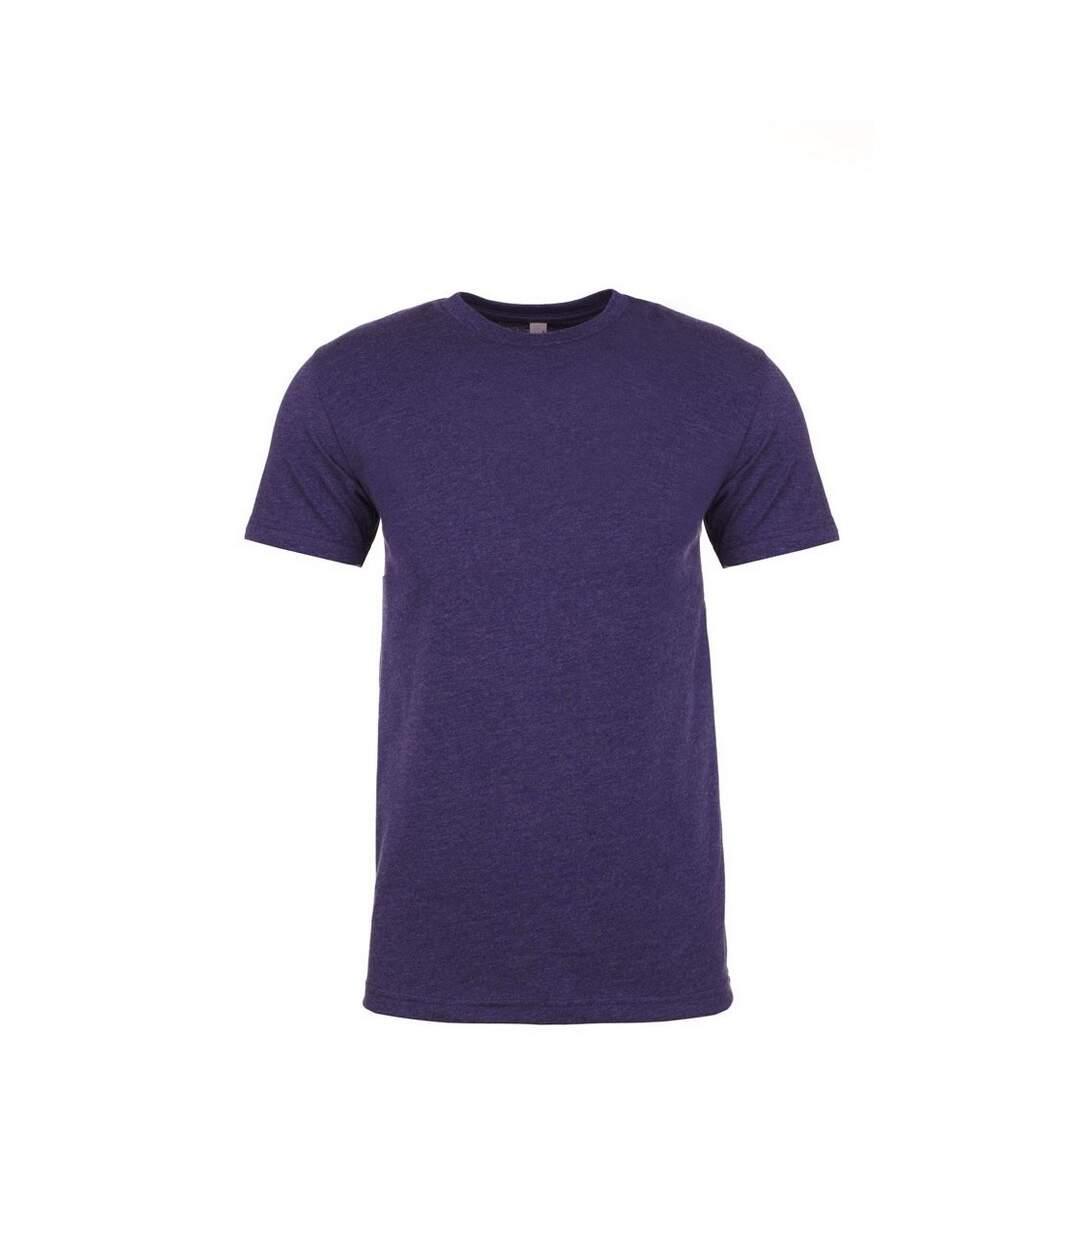 Next Level Adults Unisex CVC Crew Neck T-Shirt (Storm) - UTPC3480